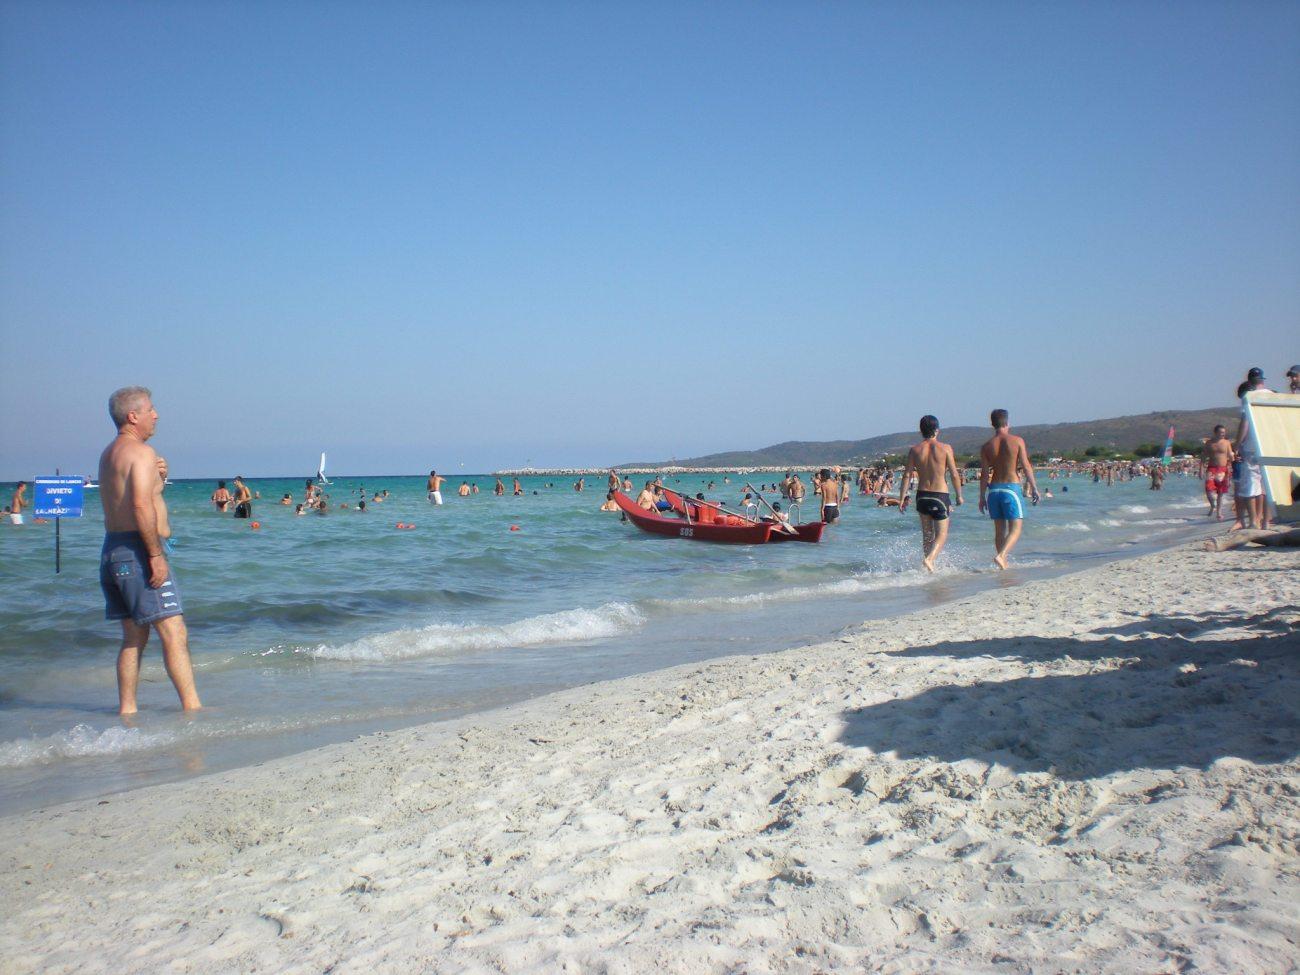 La Cinta beach, San teodoro, Sardinia